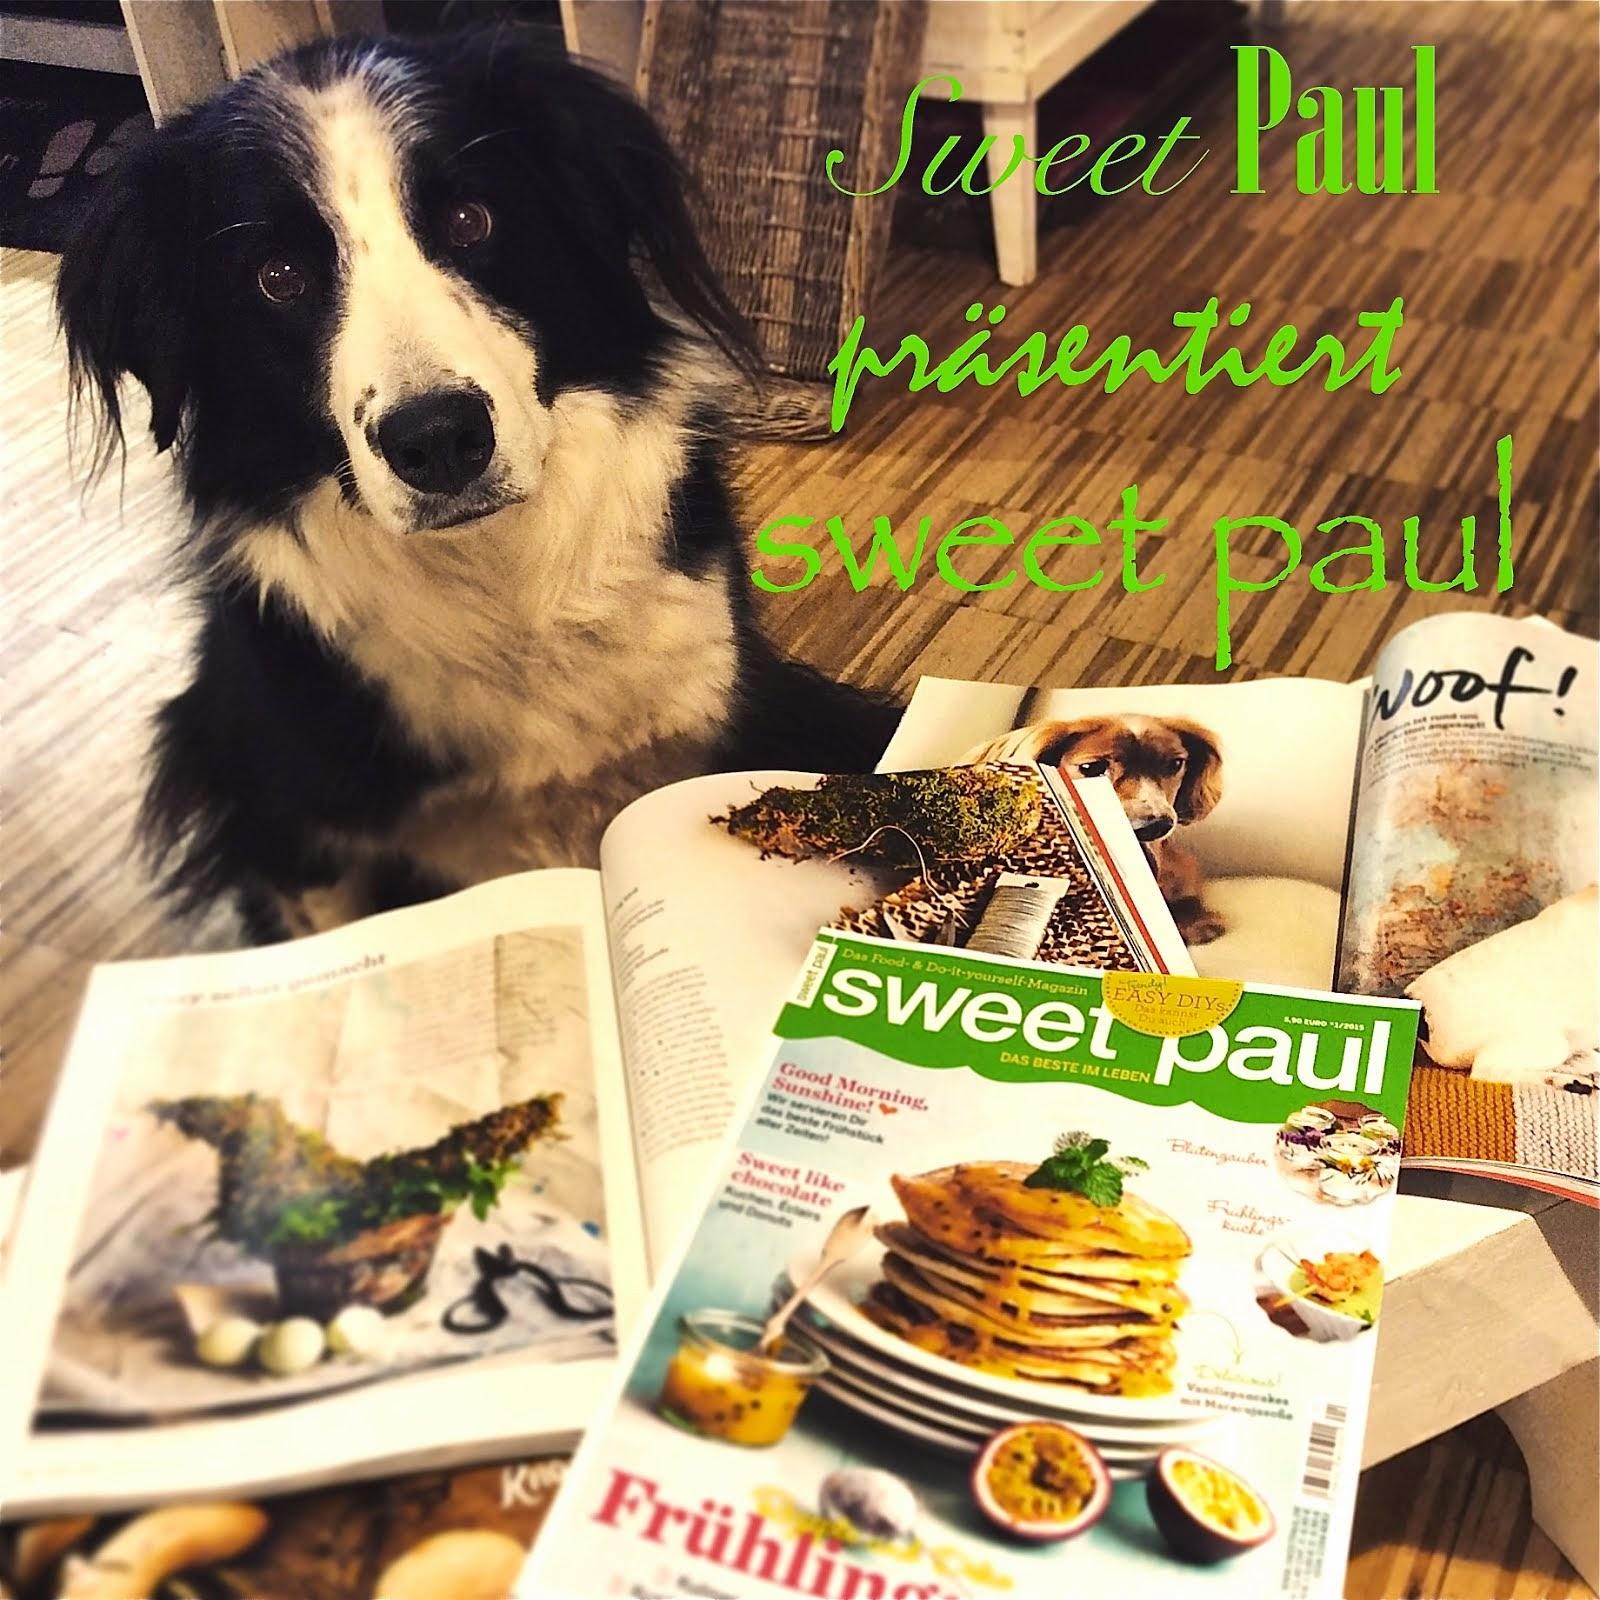 sweet paul BEI UNS ERHÄLTLICH